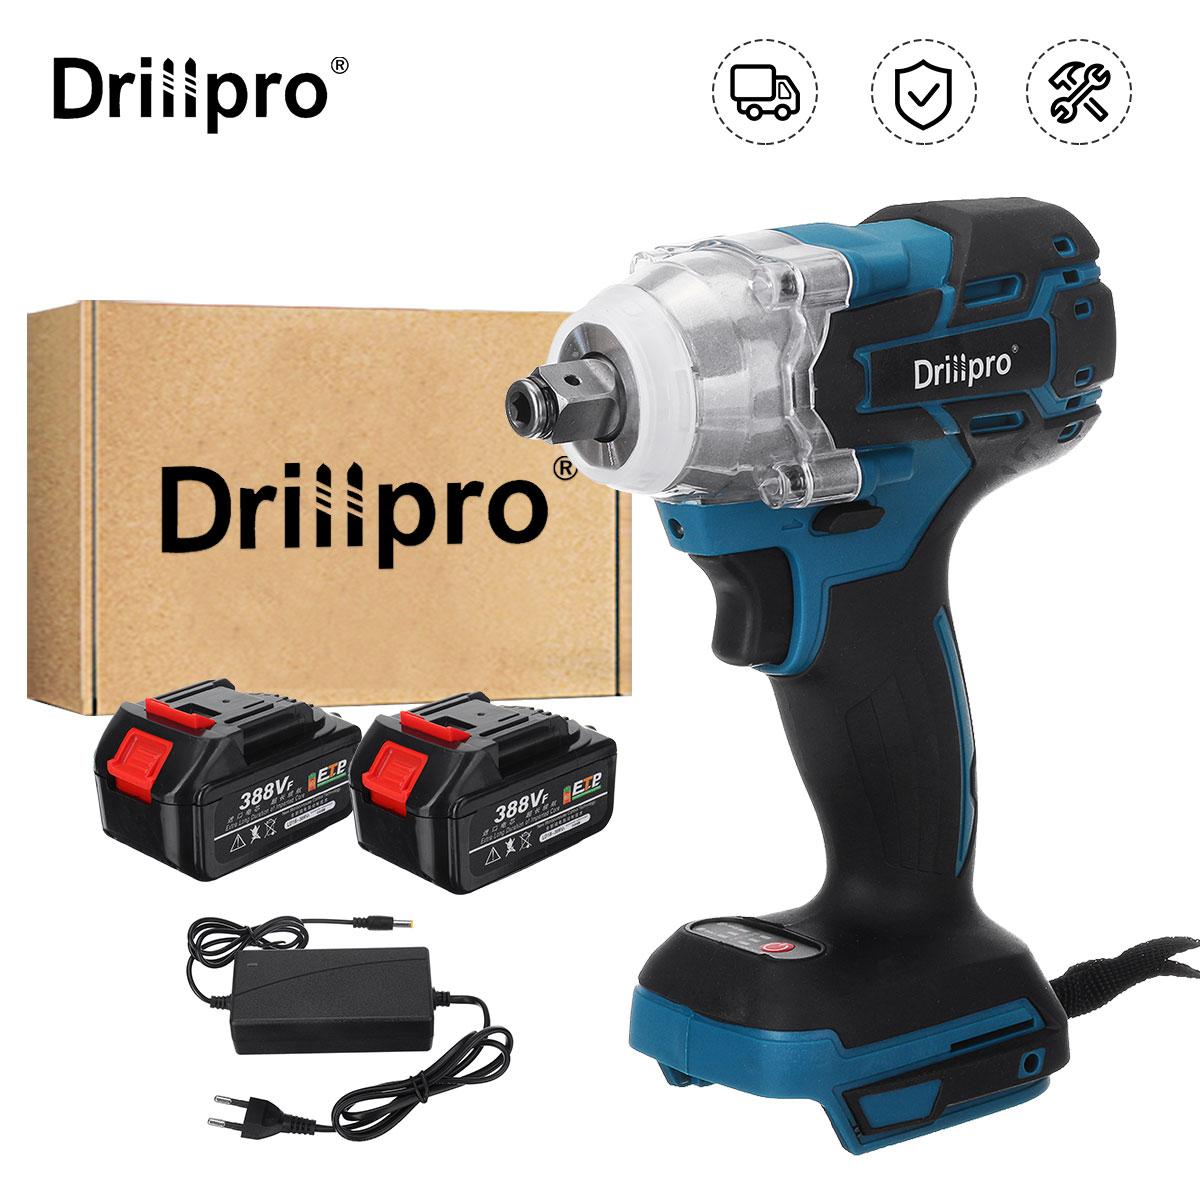 Drillpro 388VF 520N.M فرش لاسلكي مفتاح برغي كهربائي أدوات كهربائية 3000mAh لي إضاءة ليد للبطارية لماكيتا 18 فولت